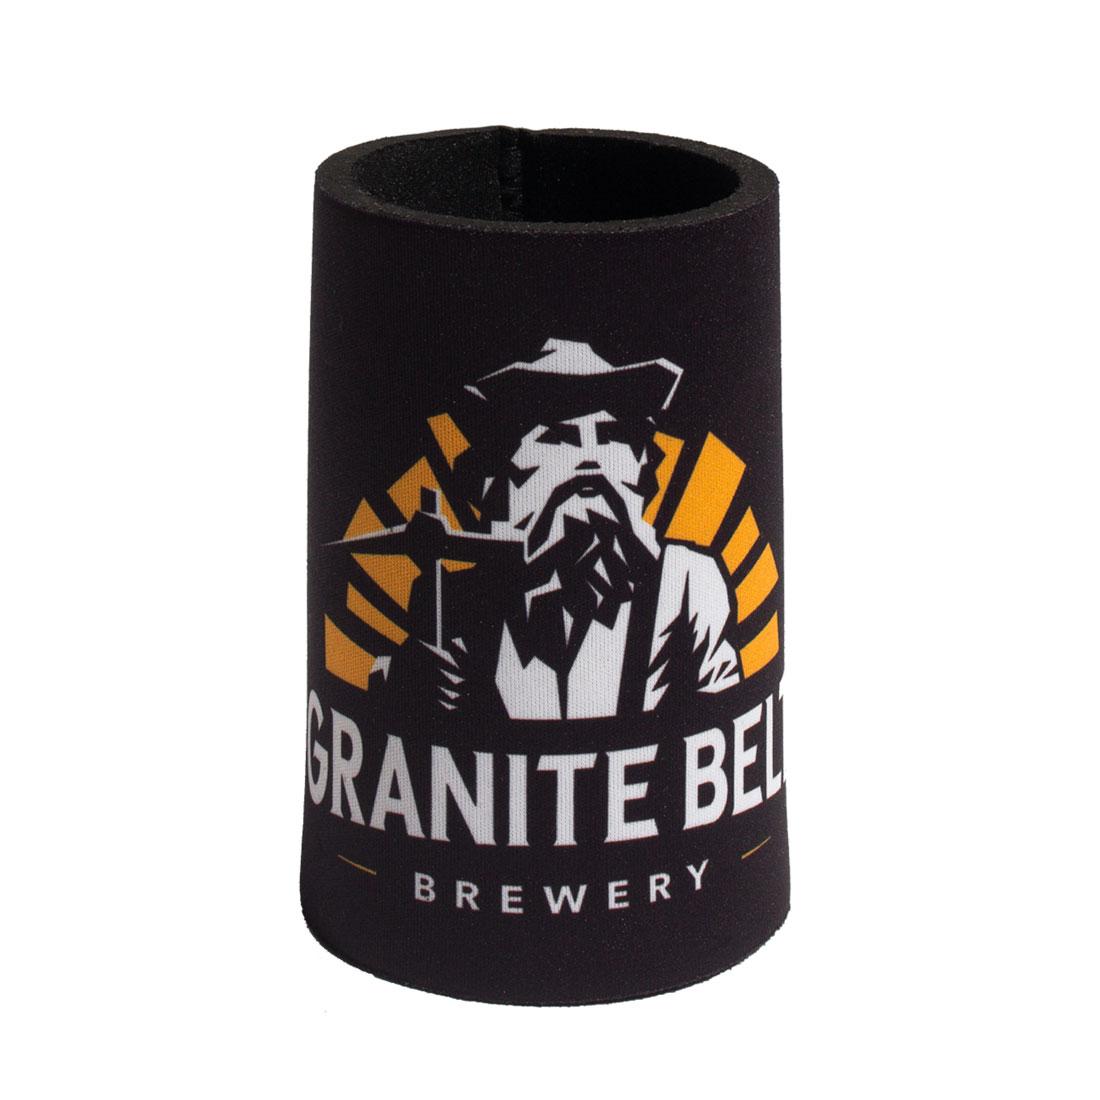 granite belt brewery stubby cooler